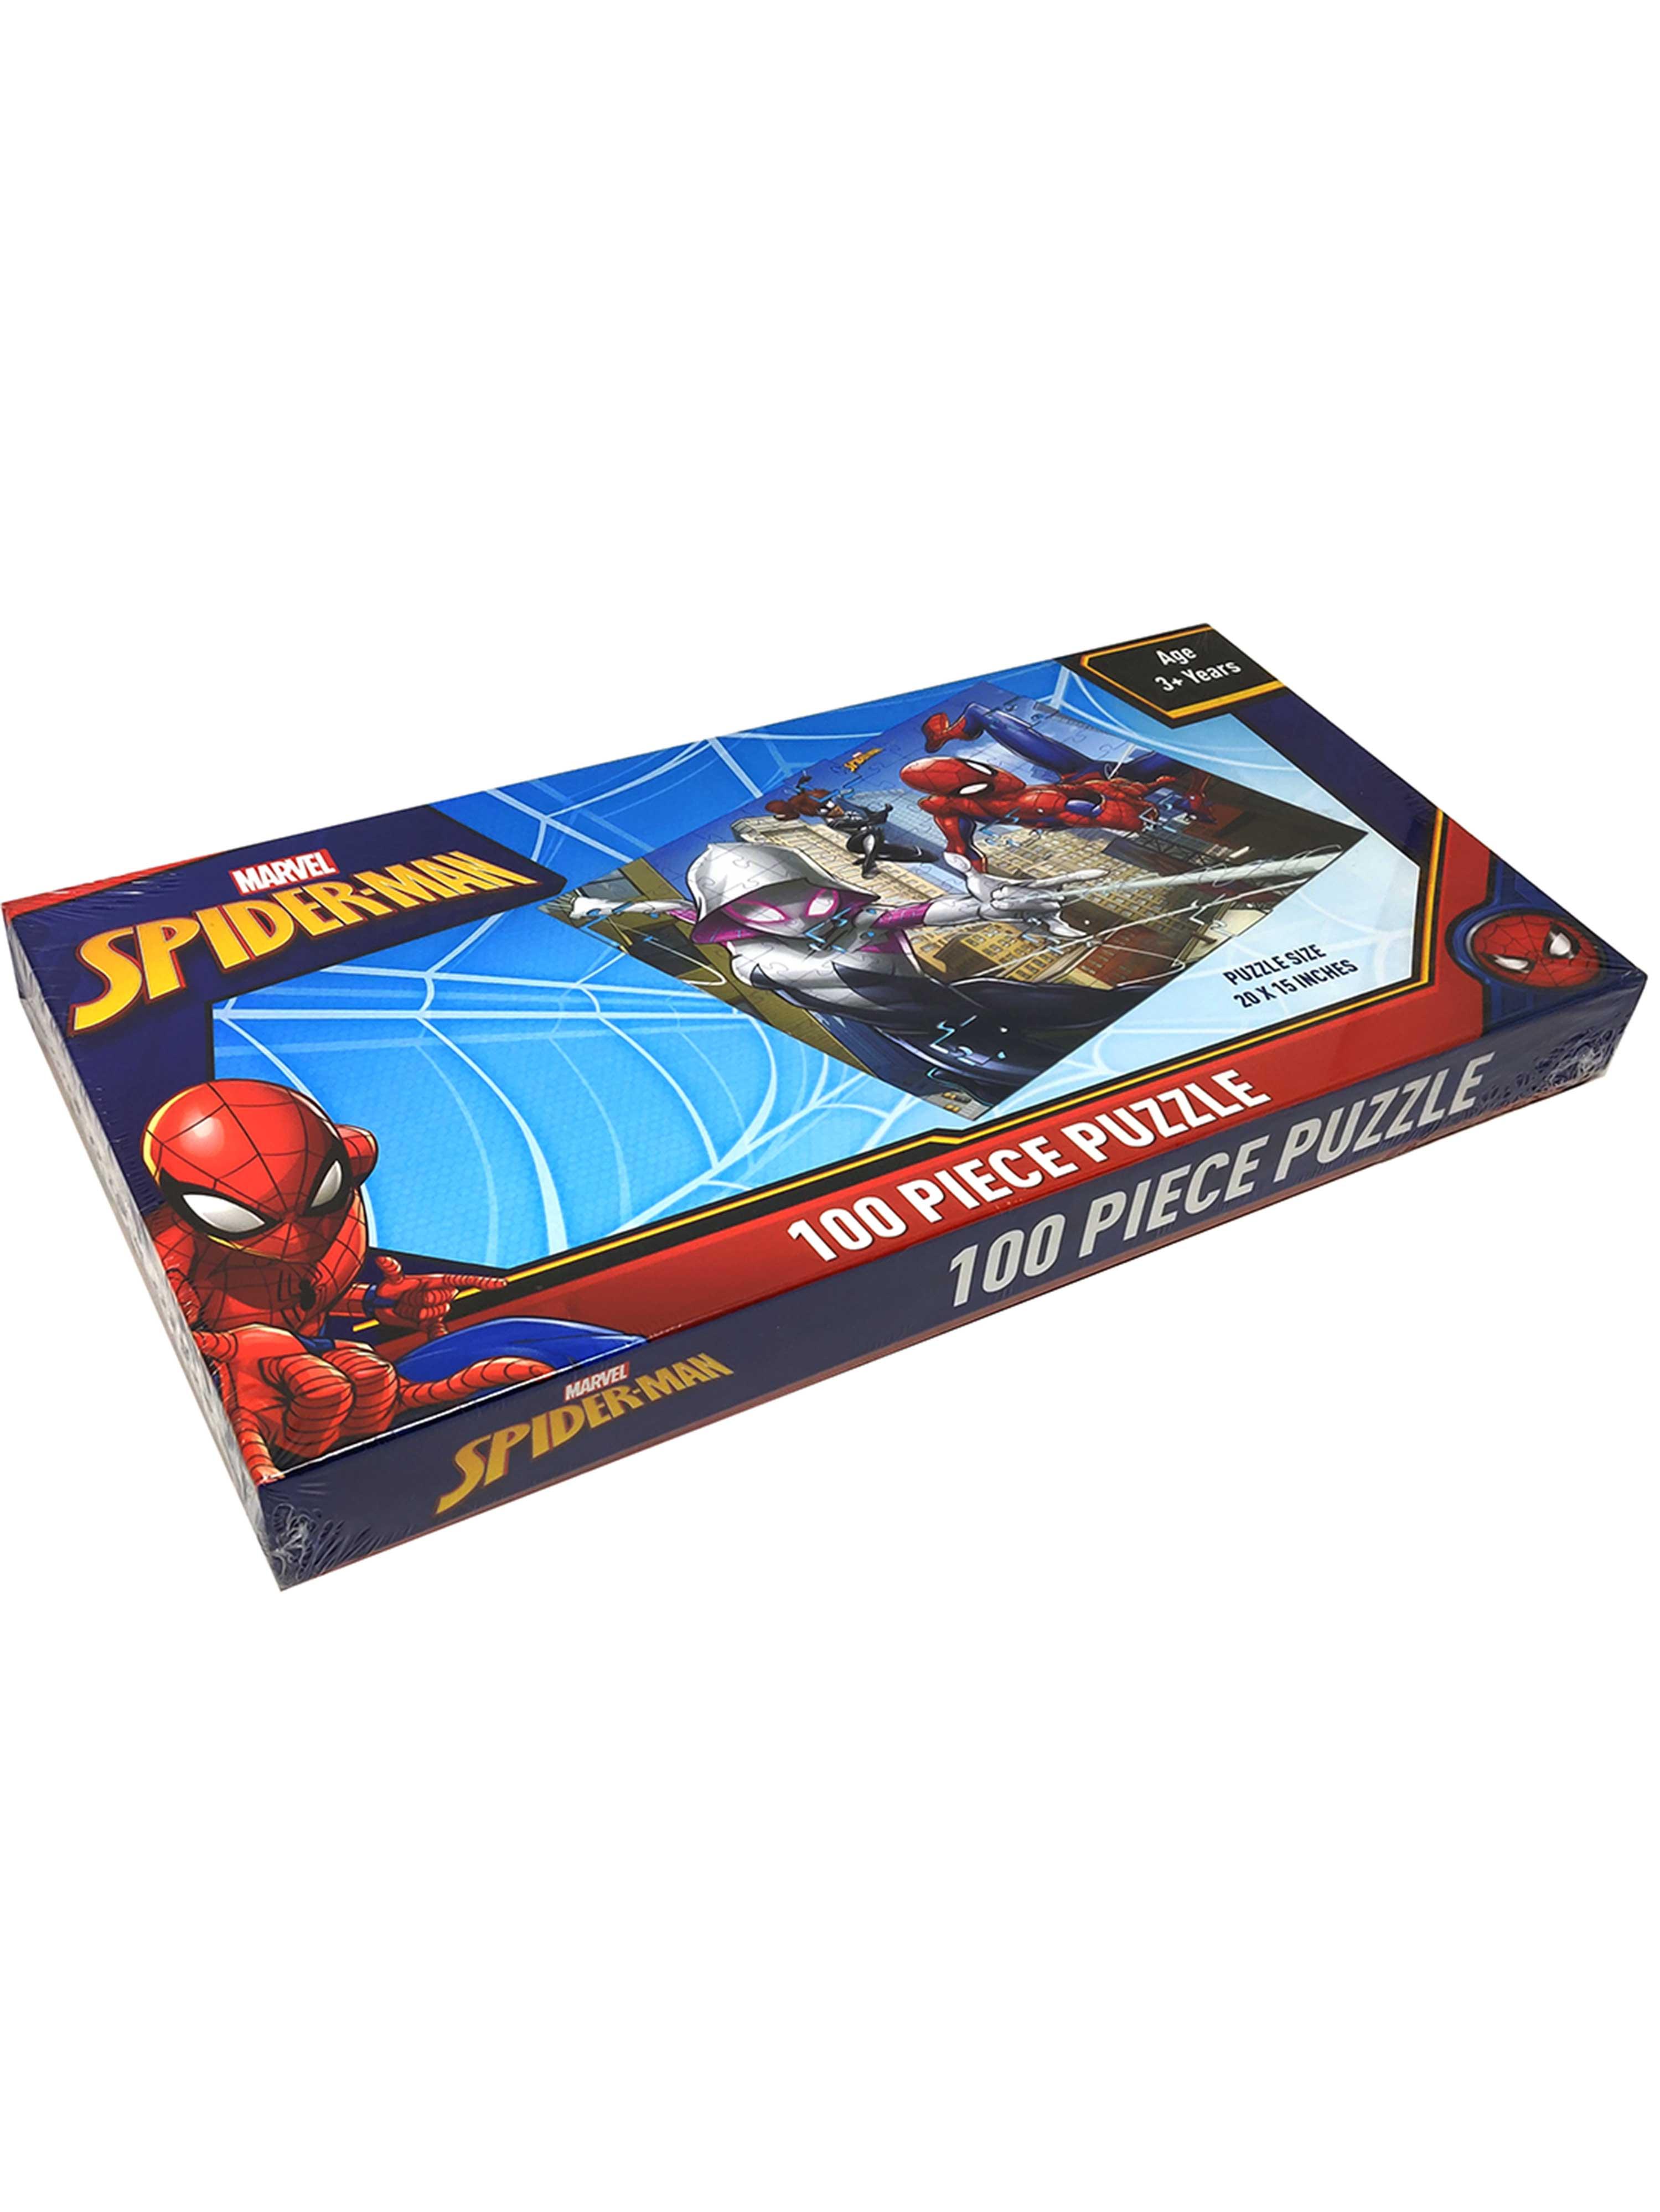 Marvel Spiderman 100 Piece Puzzle